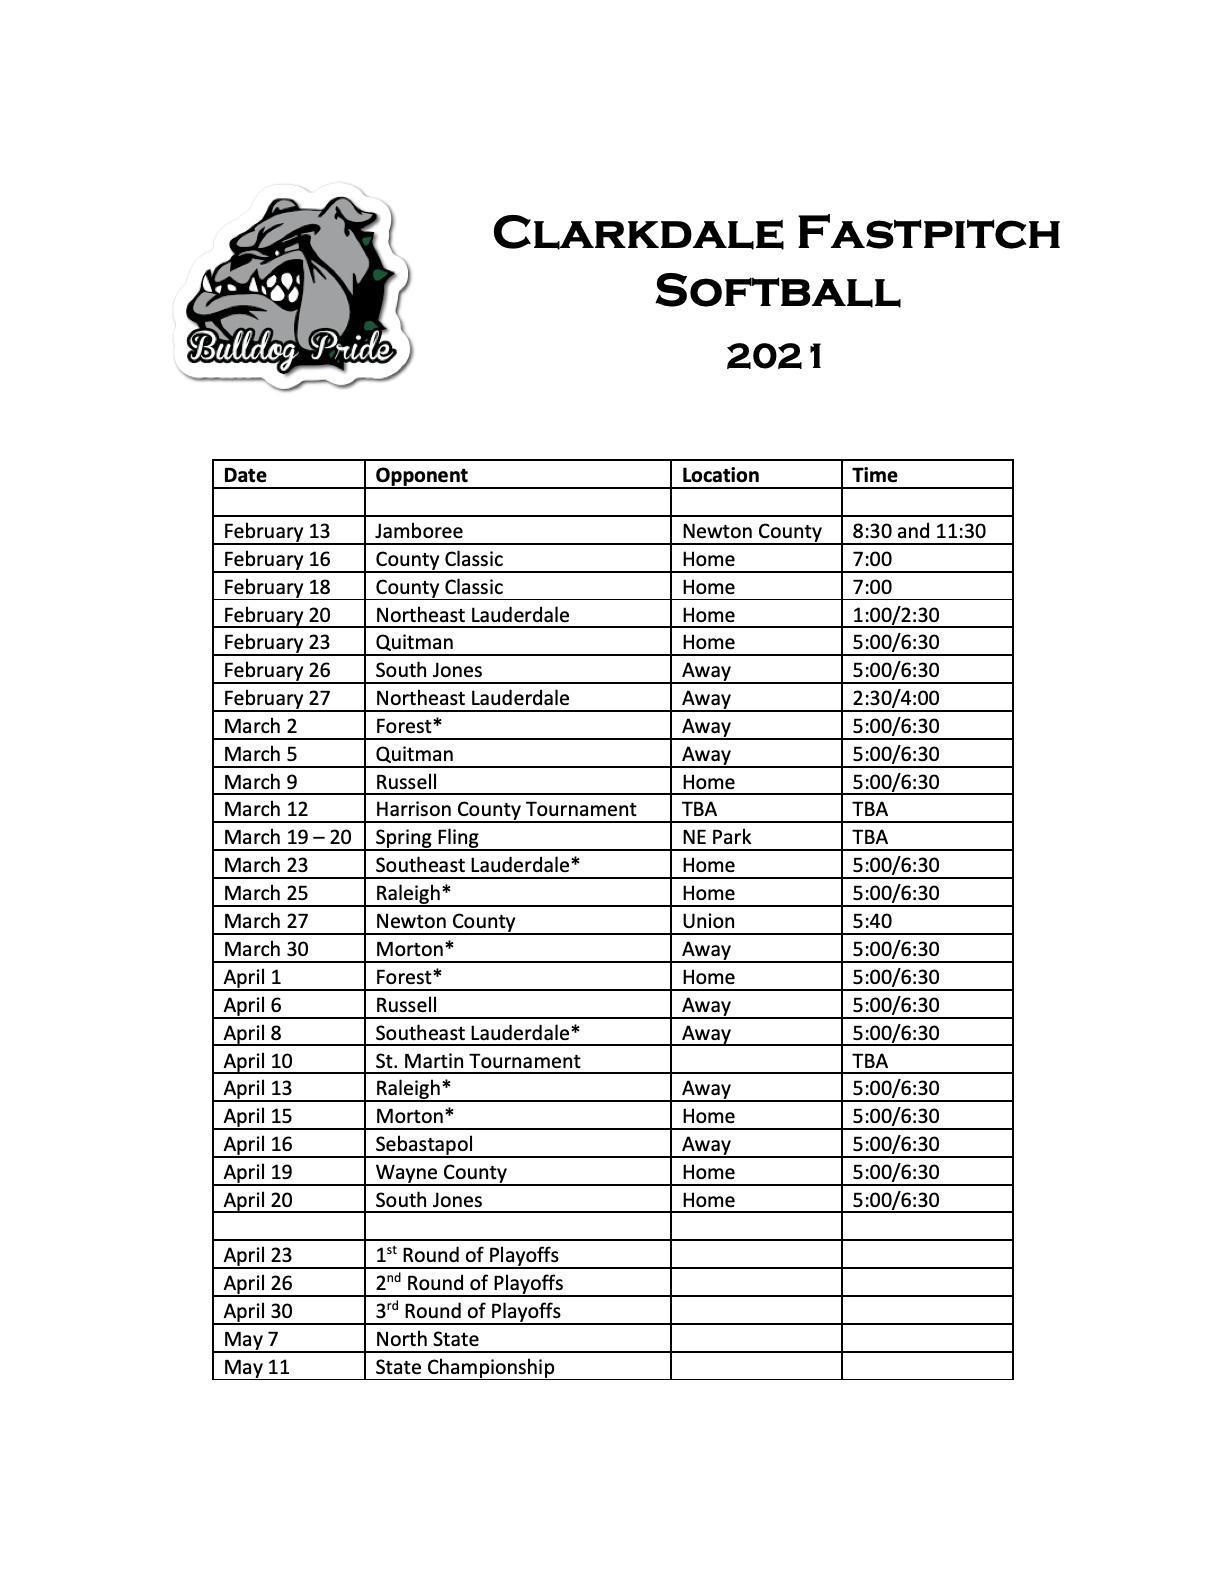 CHS 2021 Softball Schedule